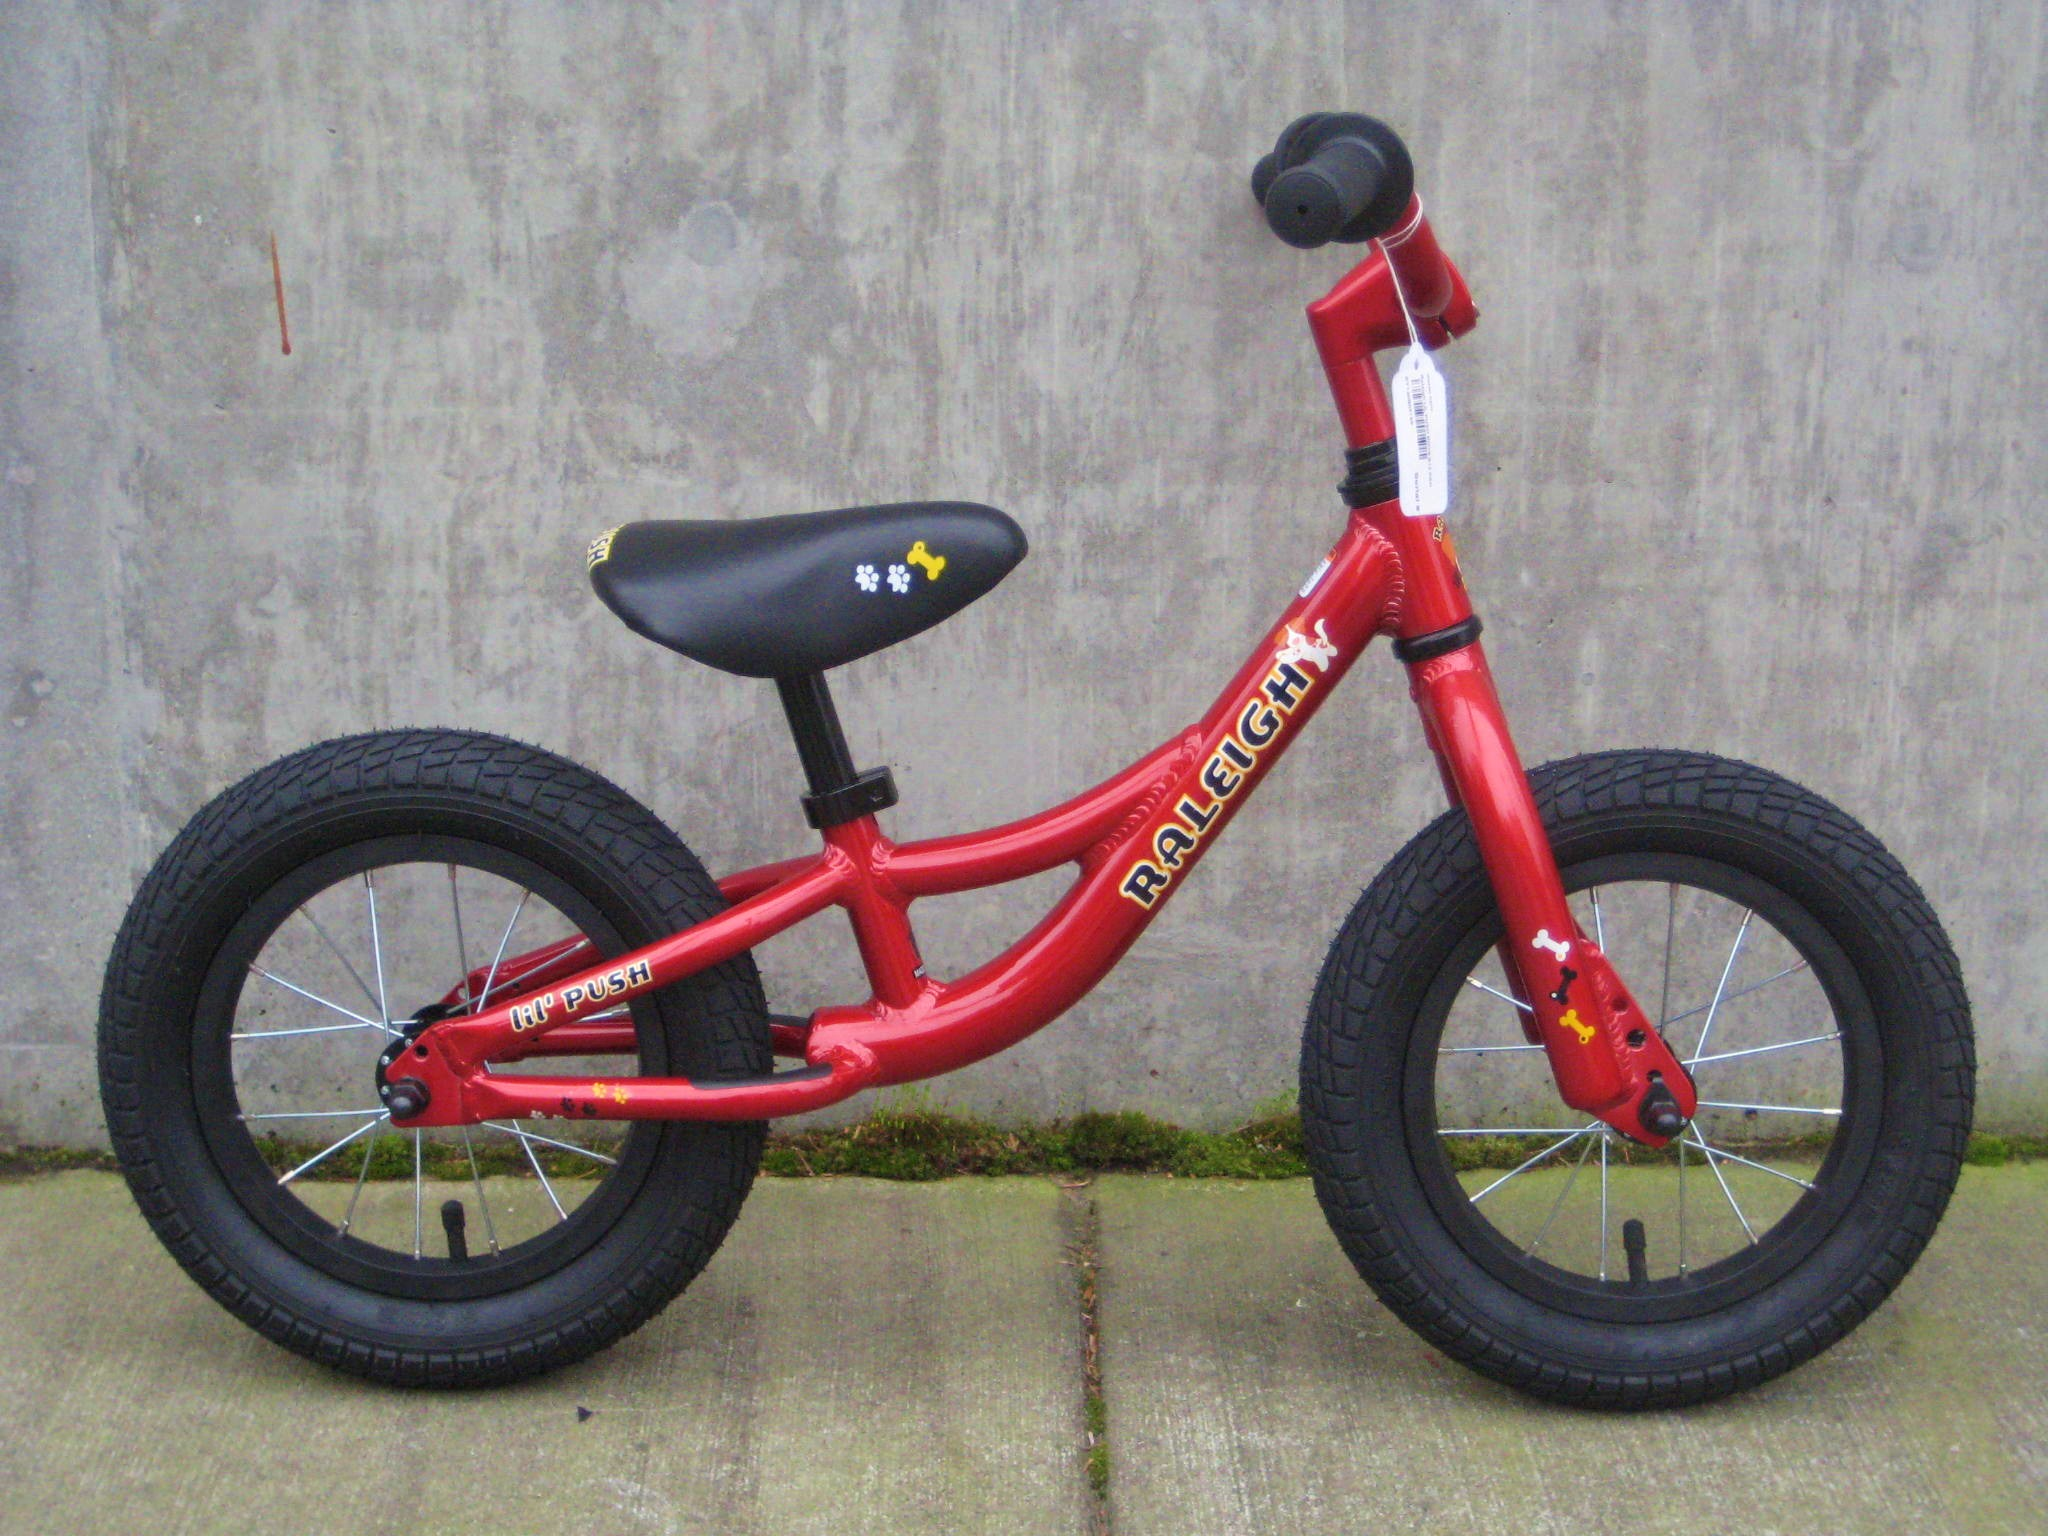 ace05cb8fe6 Fabricaciop: Push Bike